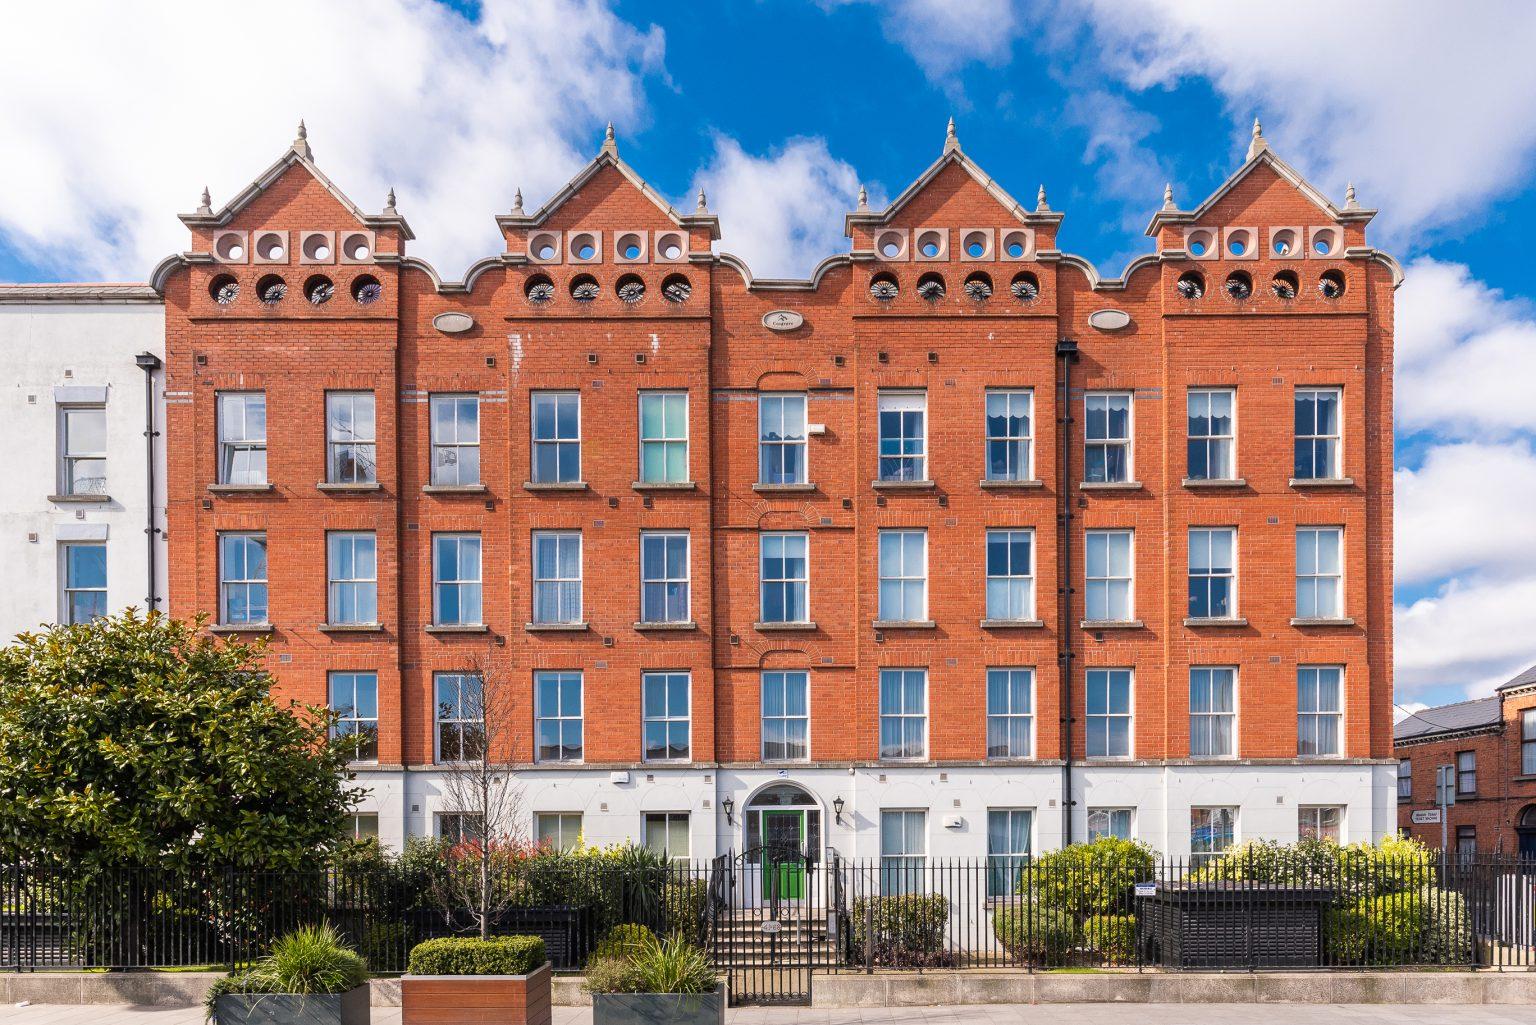 46 Derrynane Square, Lower Dorset Street, Dublin 1